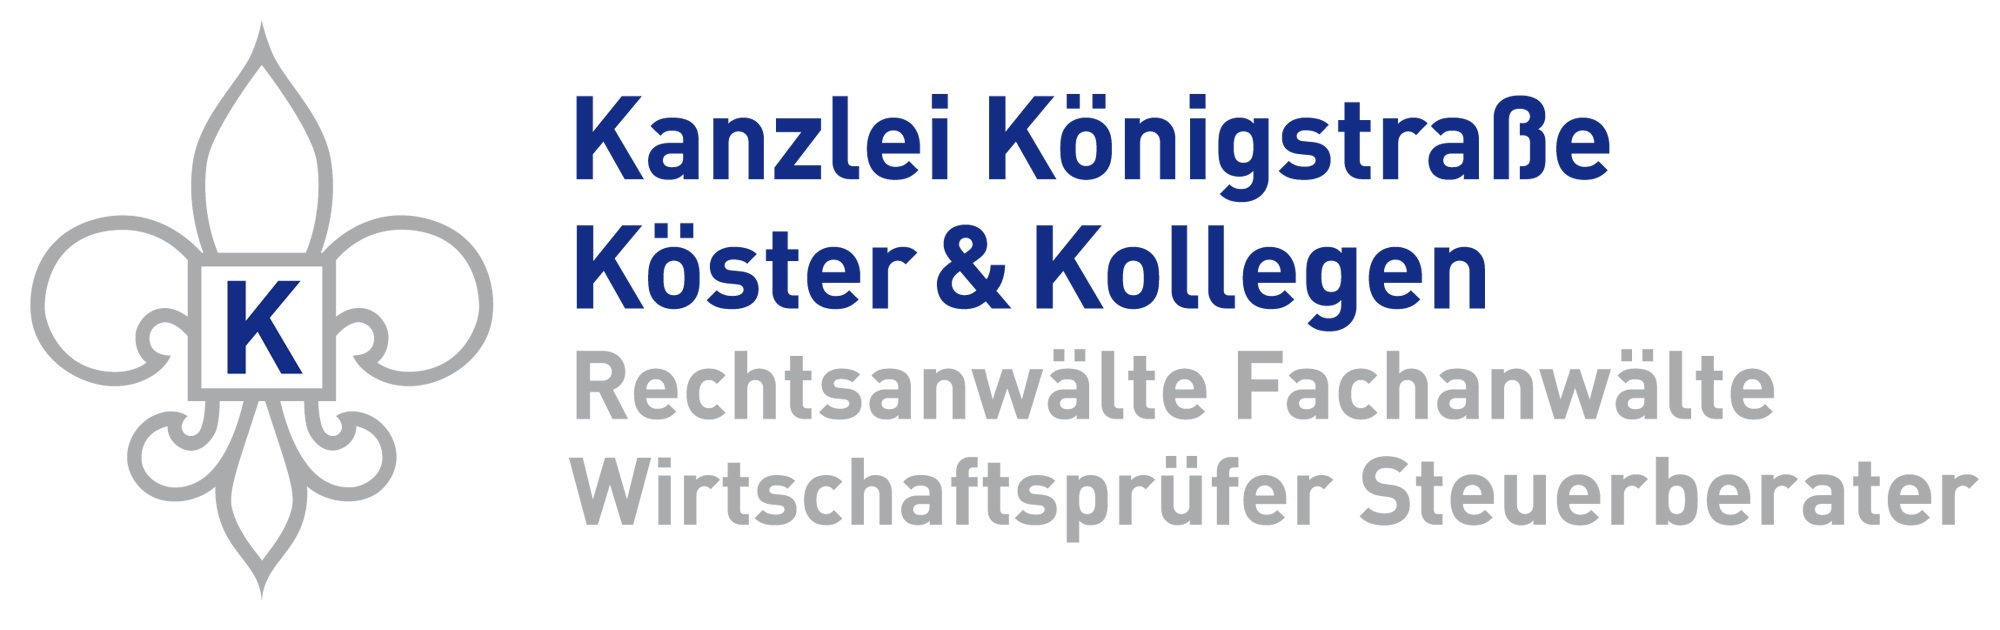 Kanzlei Königstraße – Köster & Kollegen